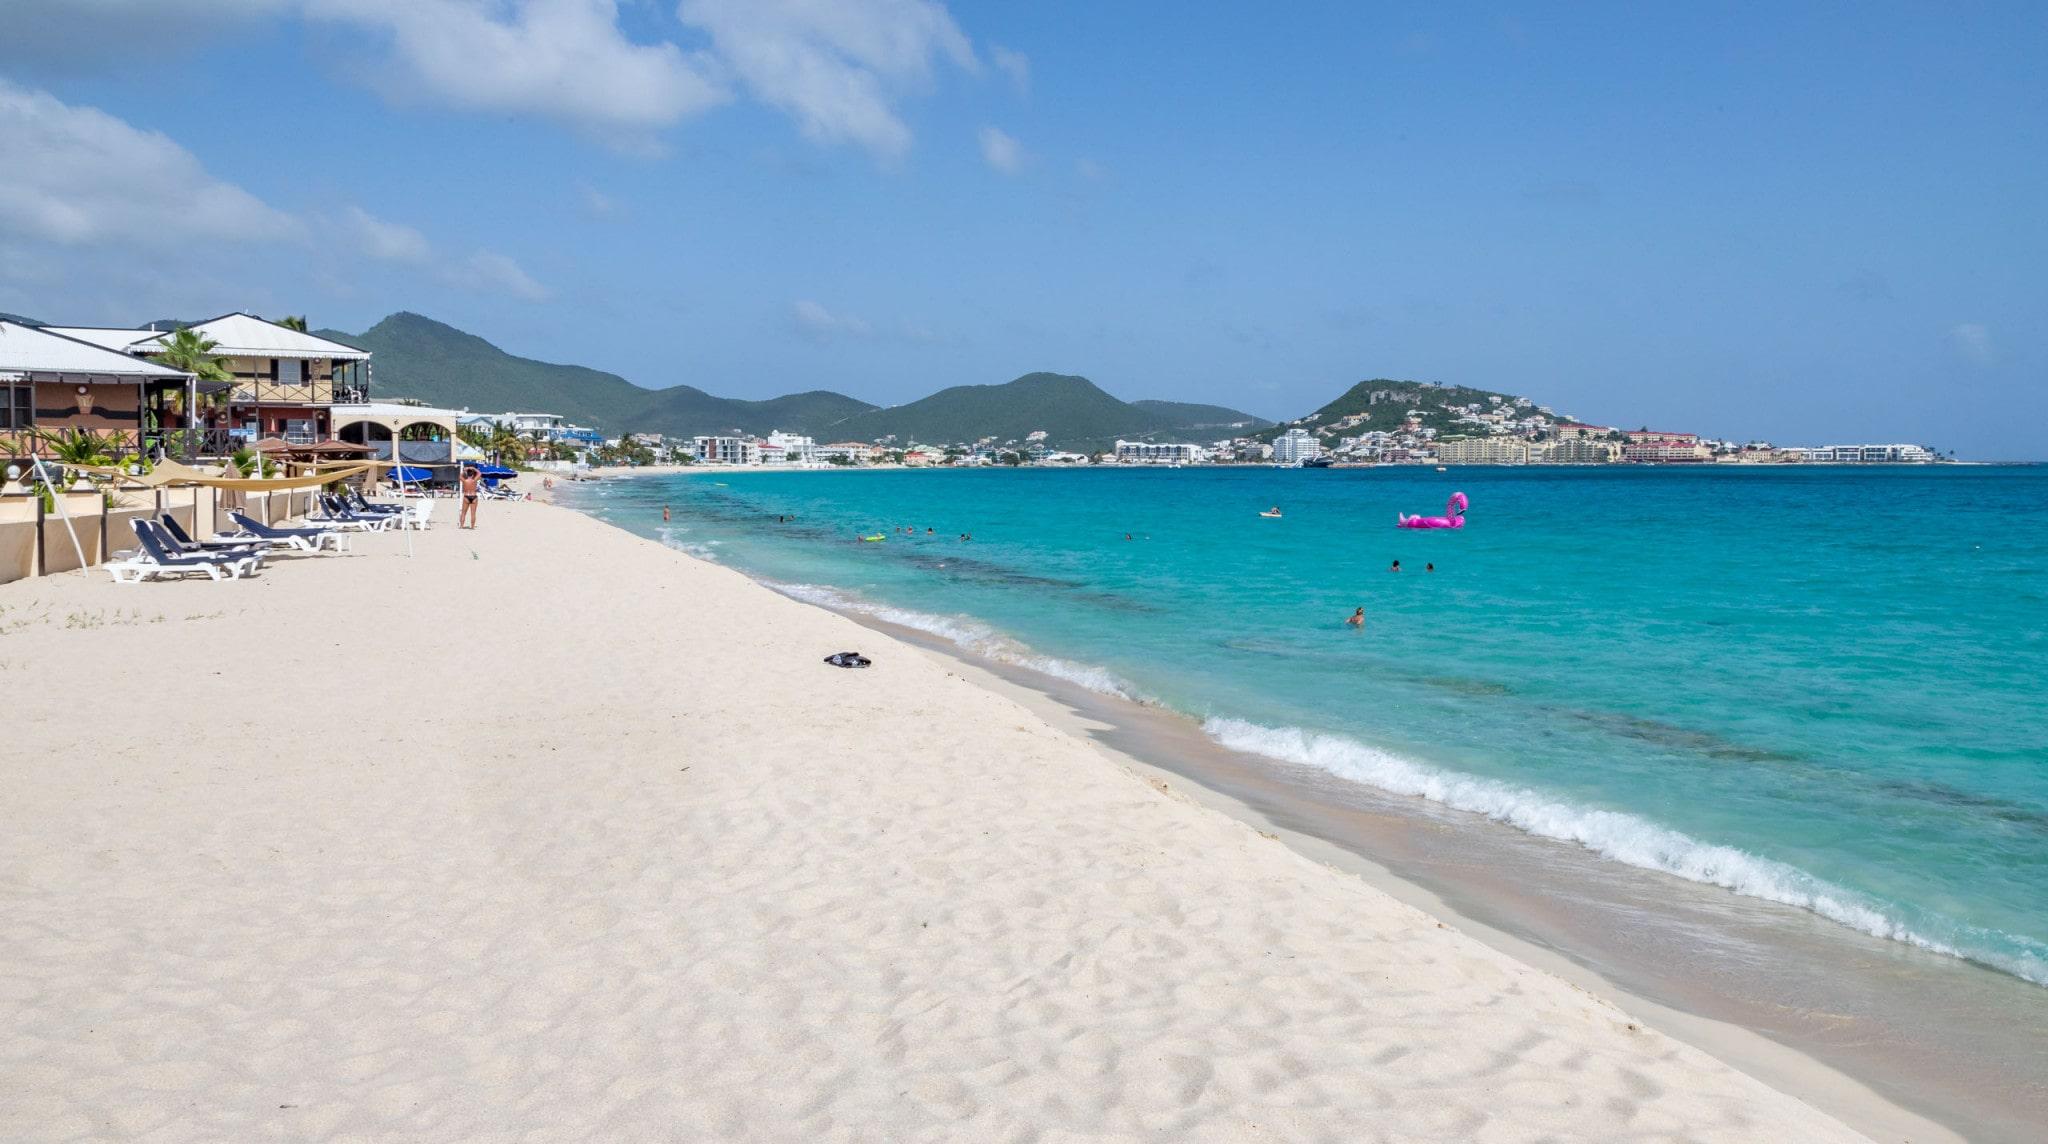 Simpson bay beach - CARIBBEAN - 2 weeks St. Maarten itinerary & island-hopping guide to St. Eustatius & Saba